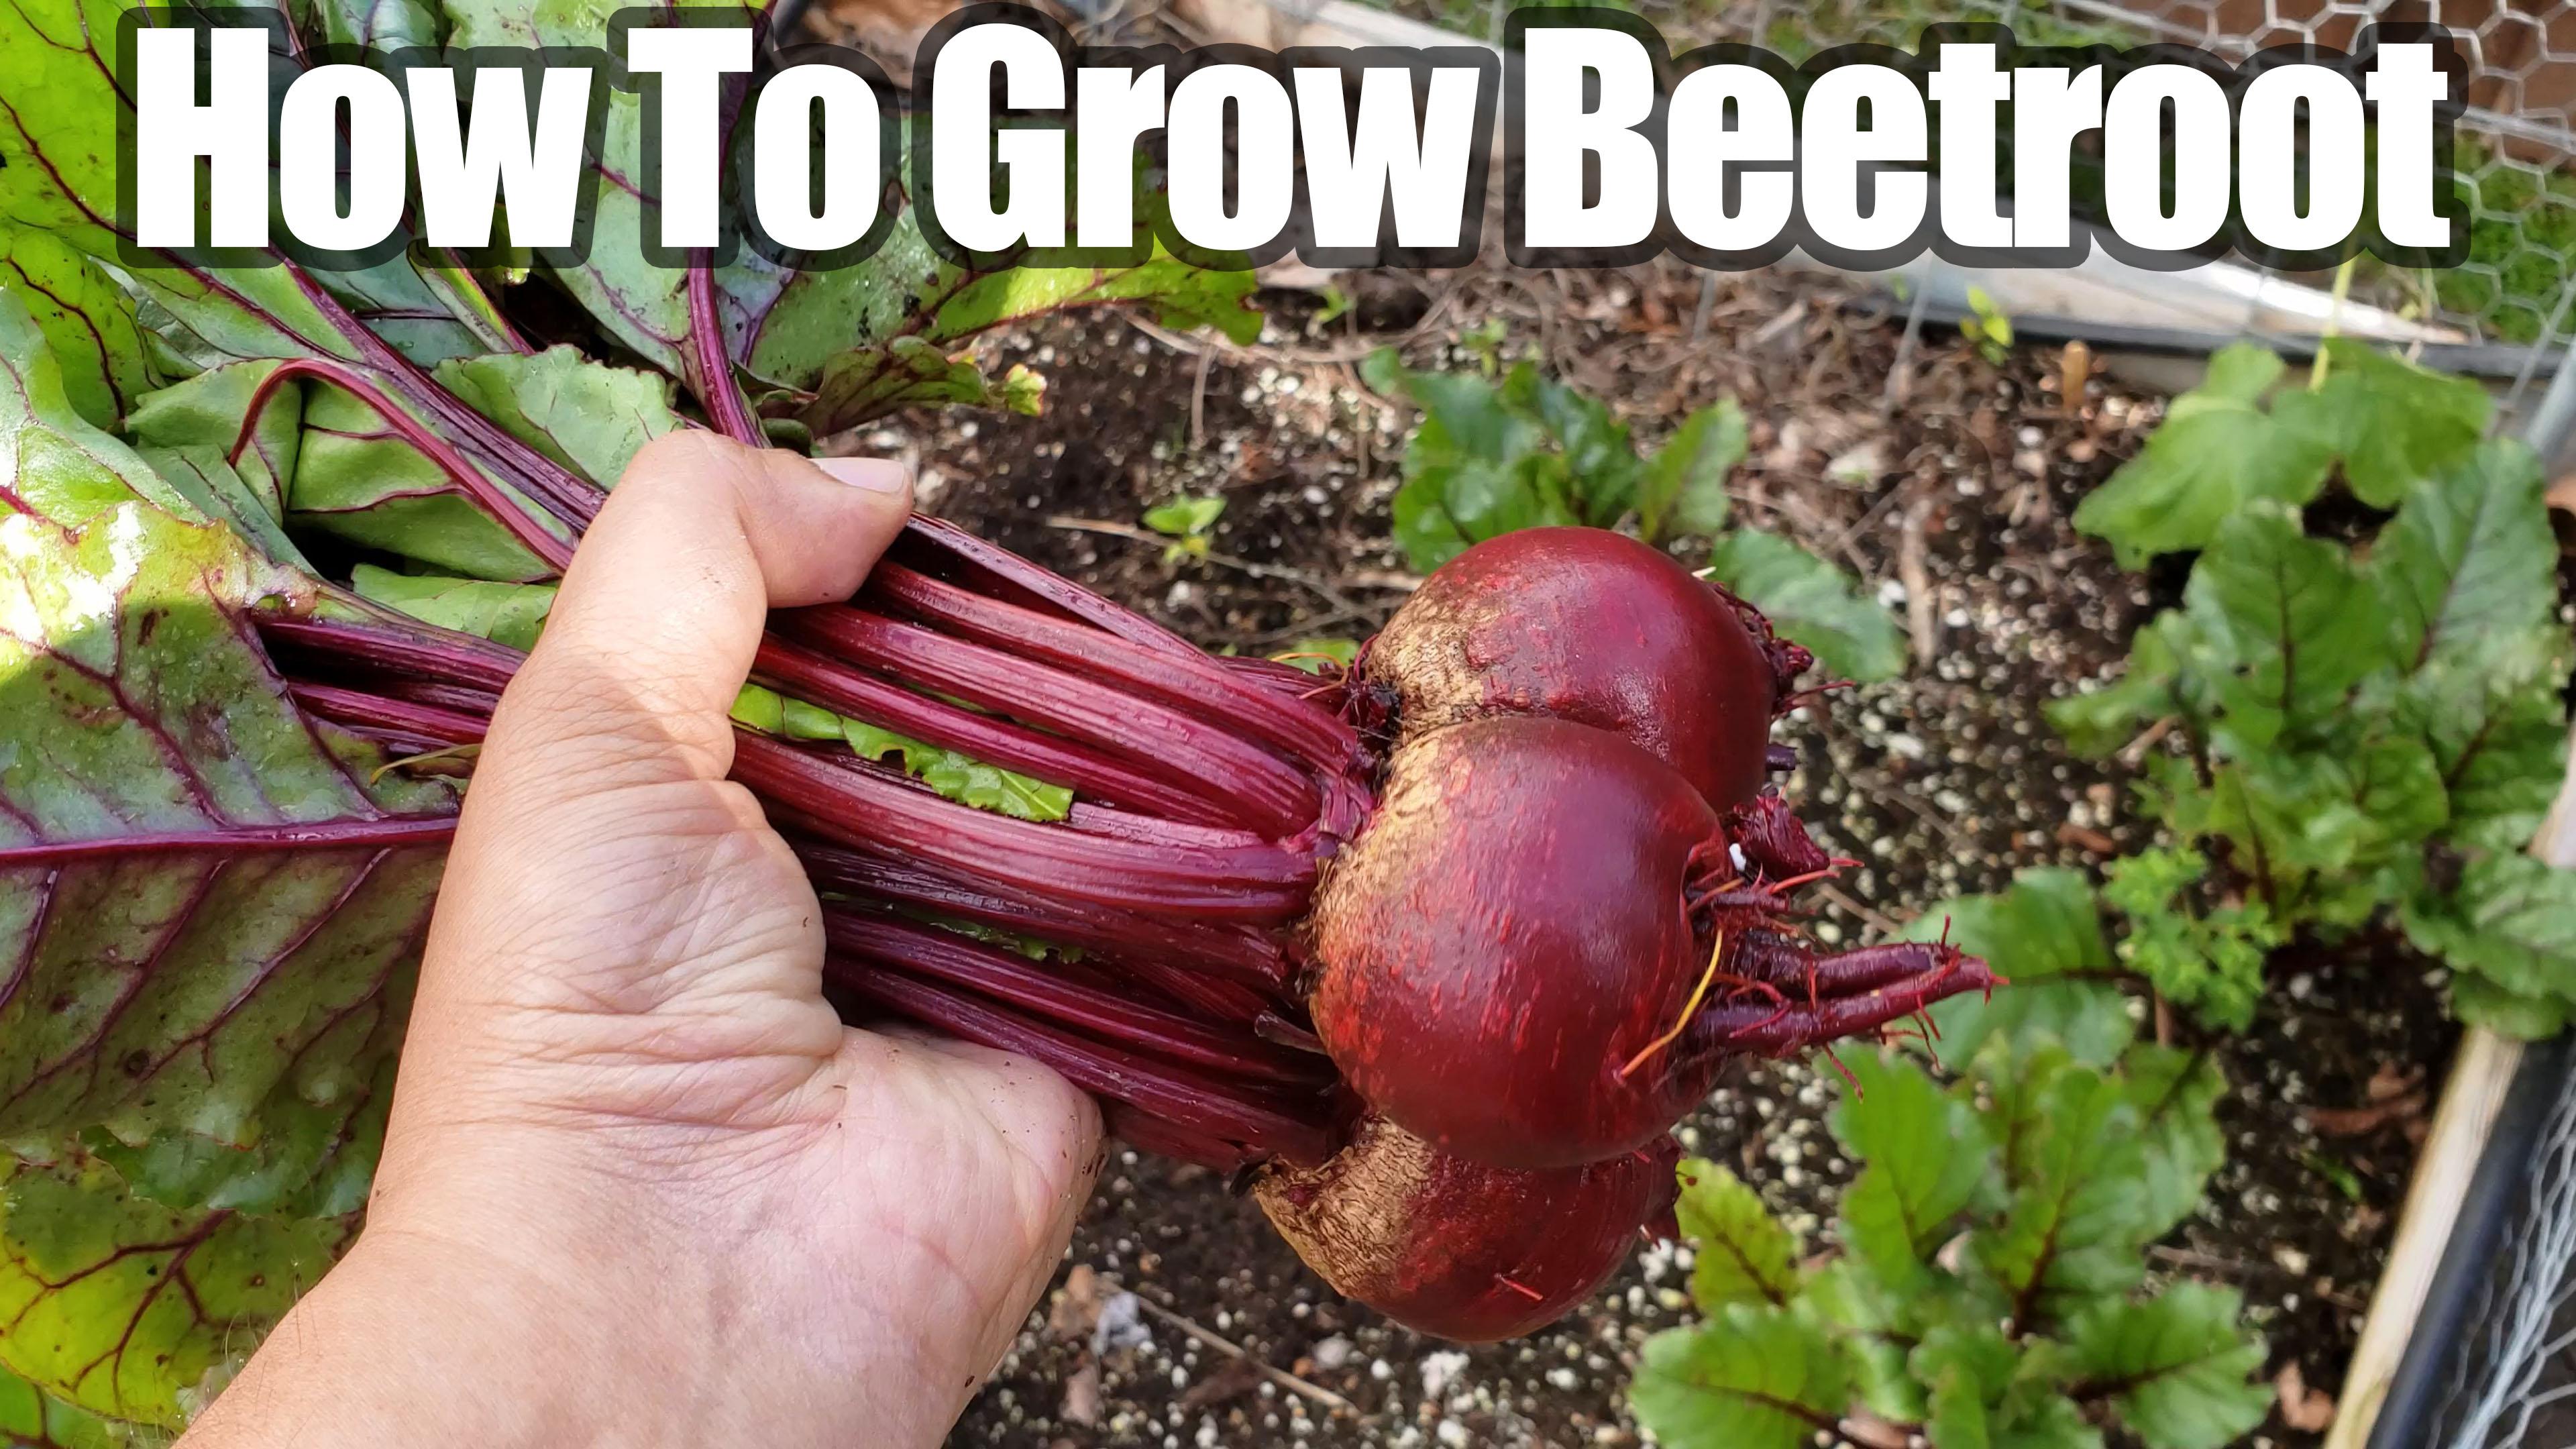 Growing Beetroot or Beets In Your Vegetable Garden – How To Grow Beet or Beetroot